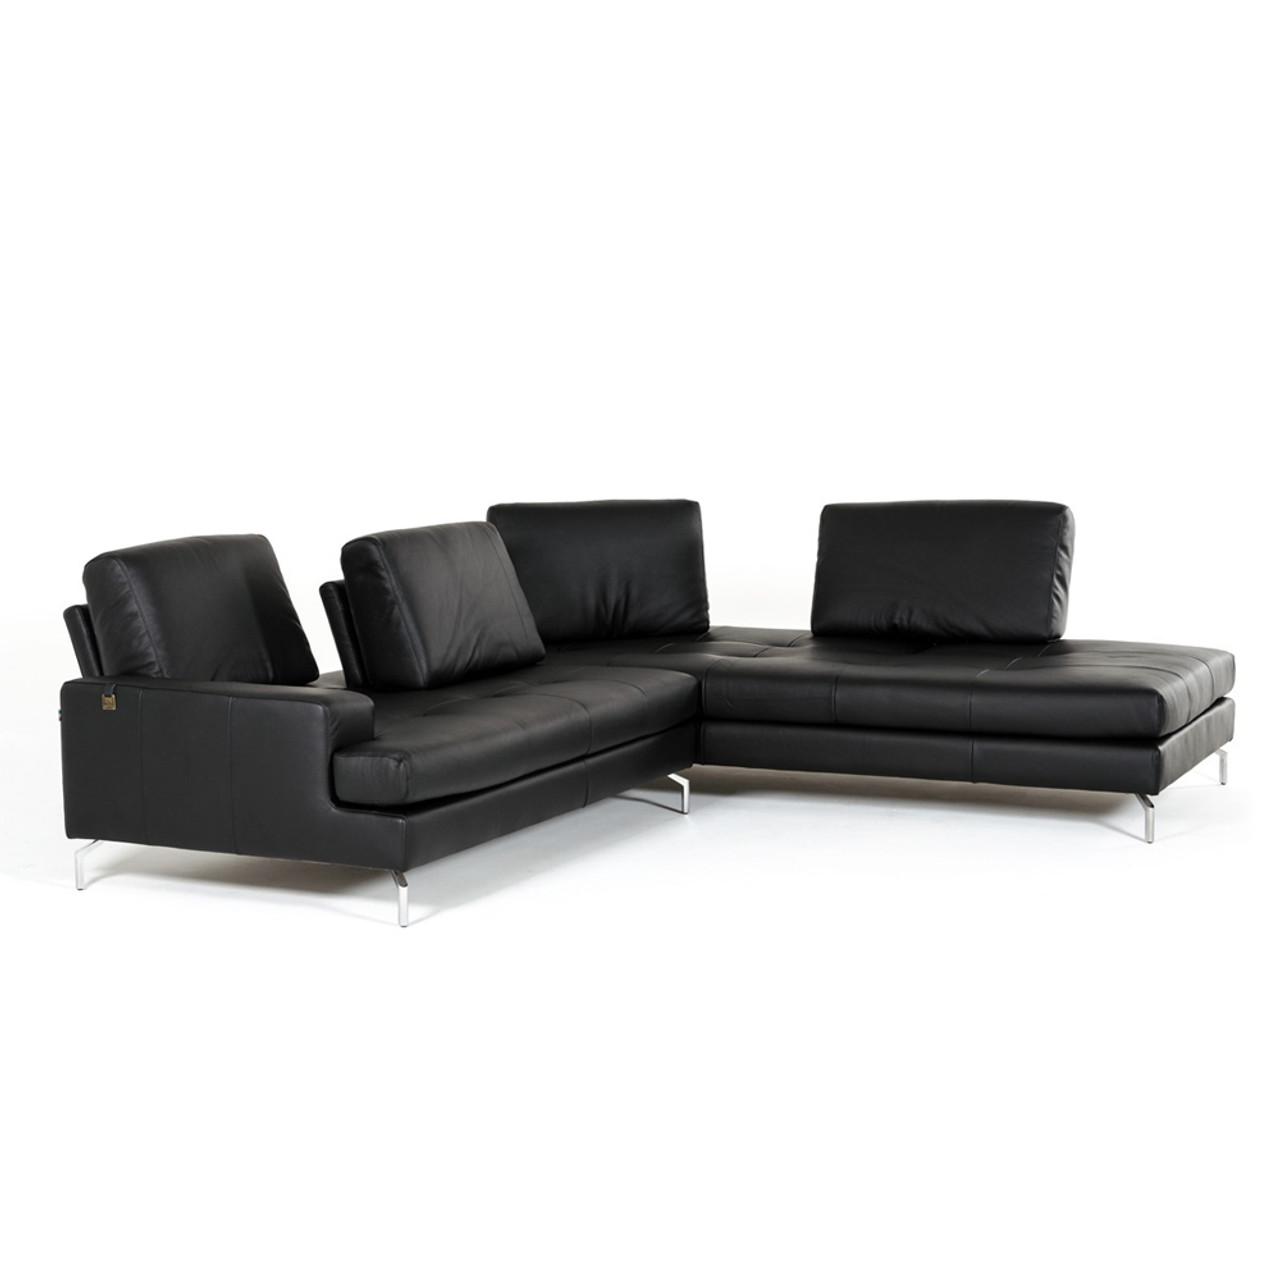 Estro Salotti Voyager Modern Black Leather Sectional Sofa Lounge La